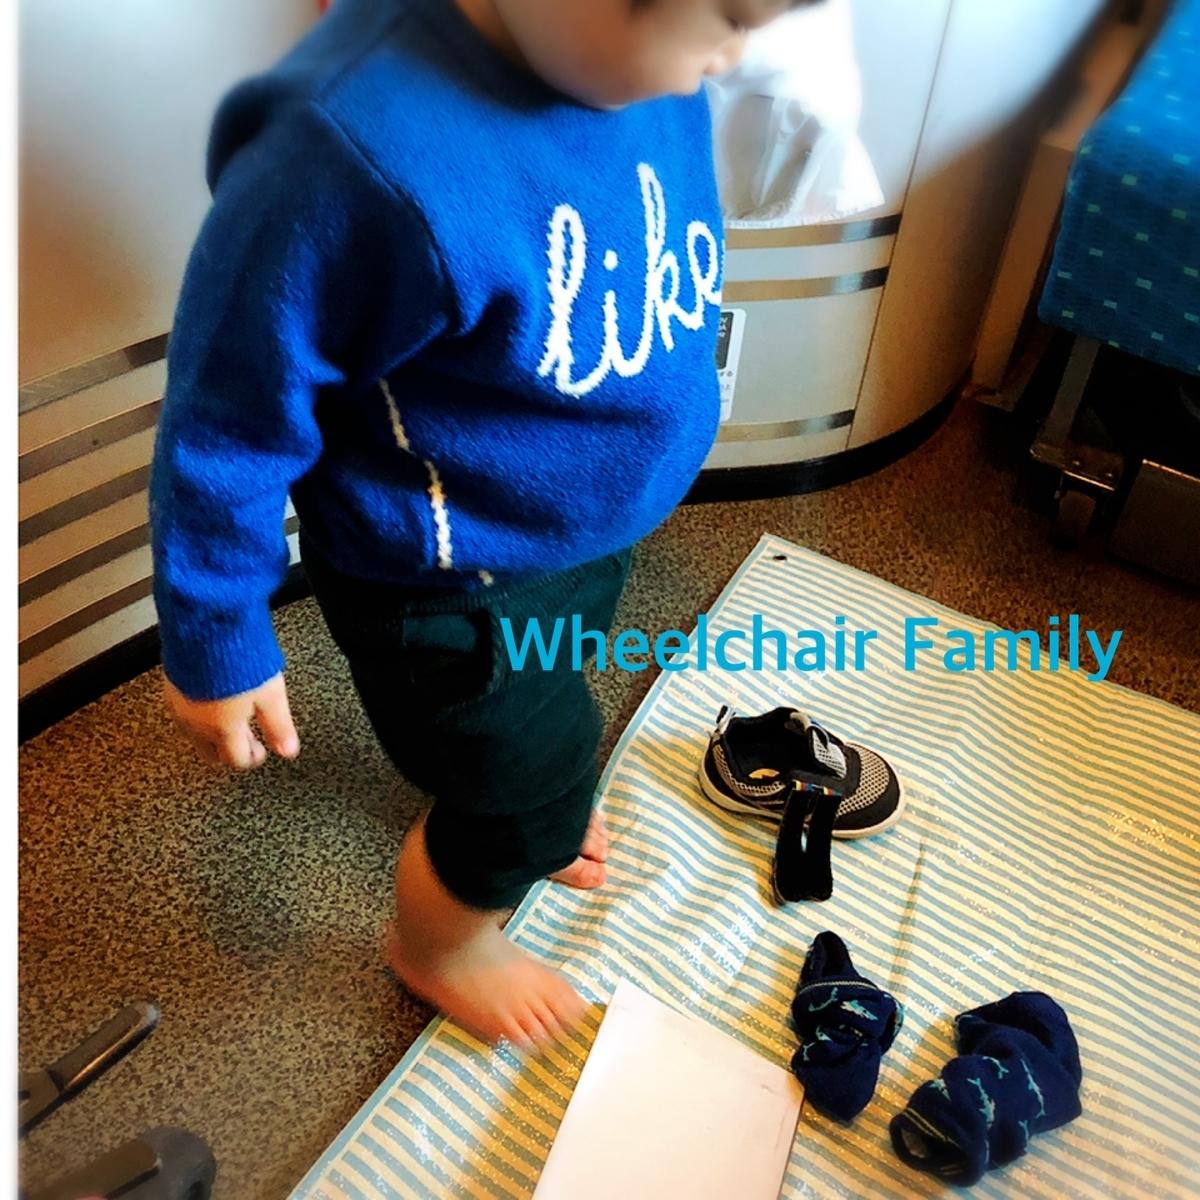 f:id:WheelchairFamily:20190719114348j:plain